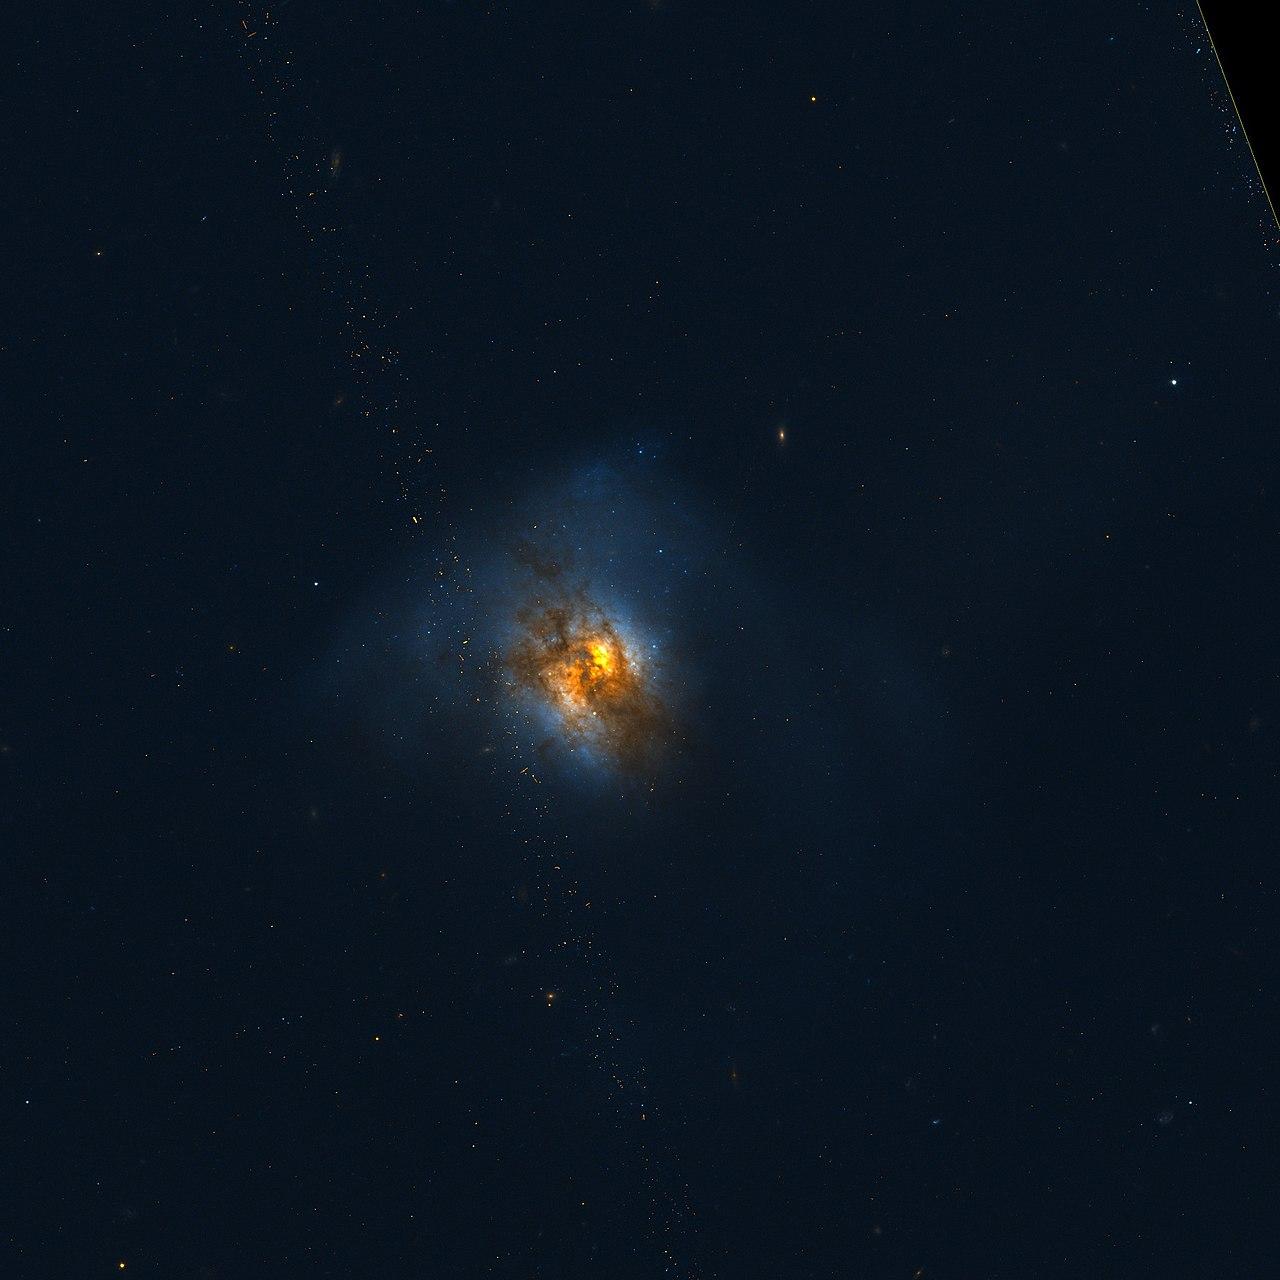 La galaxia infrarroja ultraluminosa Arp 220